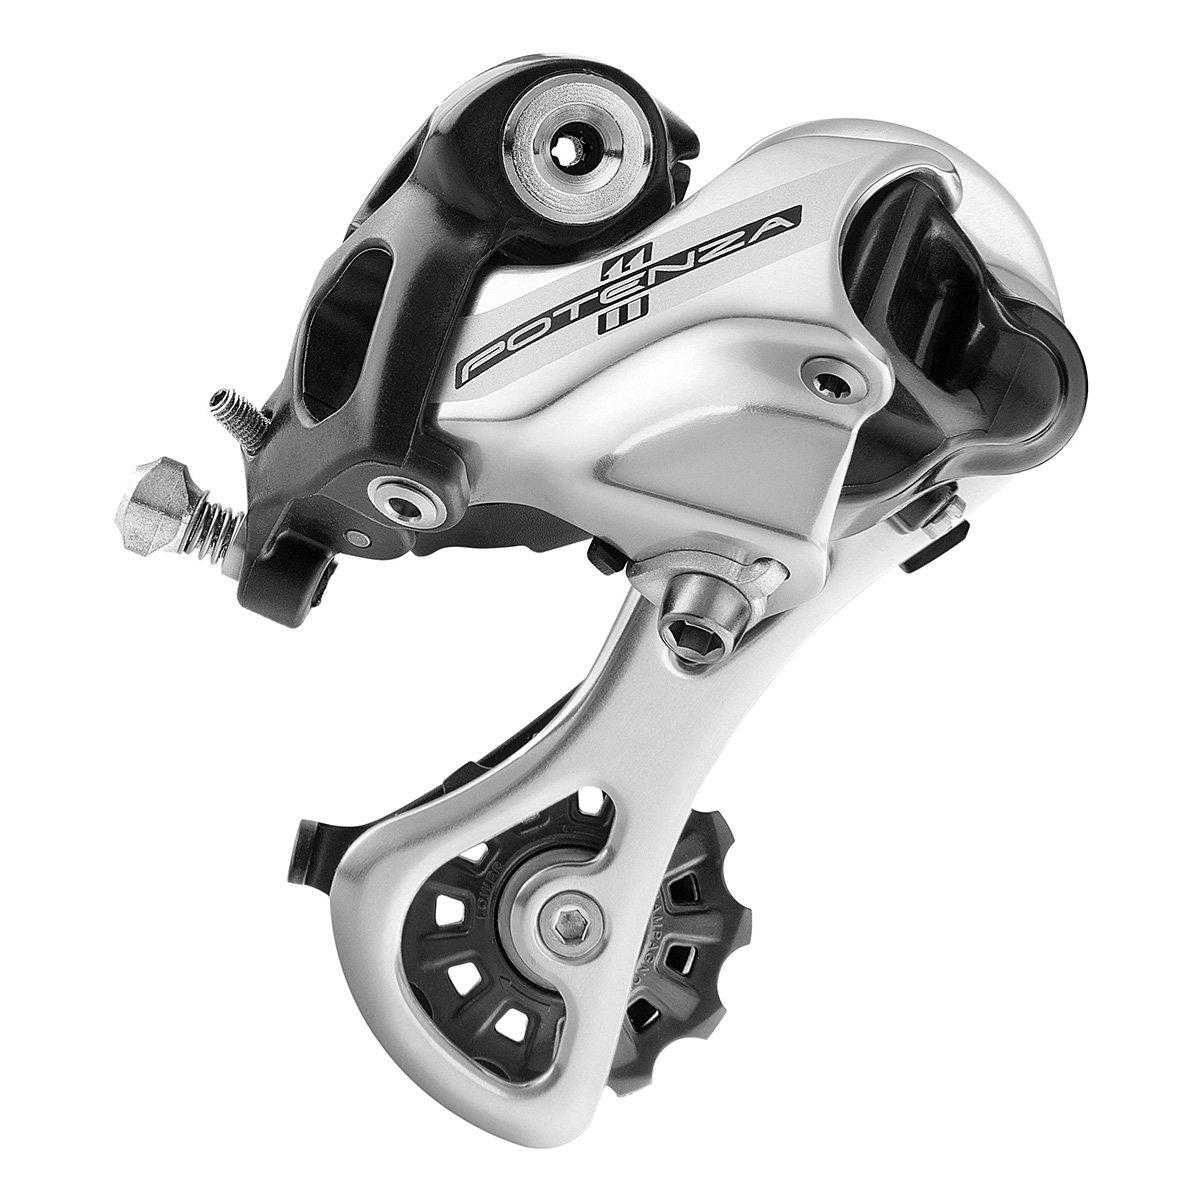 Campagnolo Potenza Ho rd18 11-speed背面自転車Derailleur B07312VV1W S(ショート)(RD18-POS1S)|シルバー シルバー S(ショート)(RD18-POS1S)